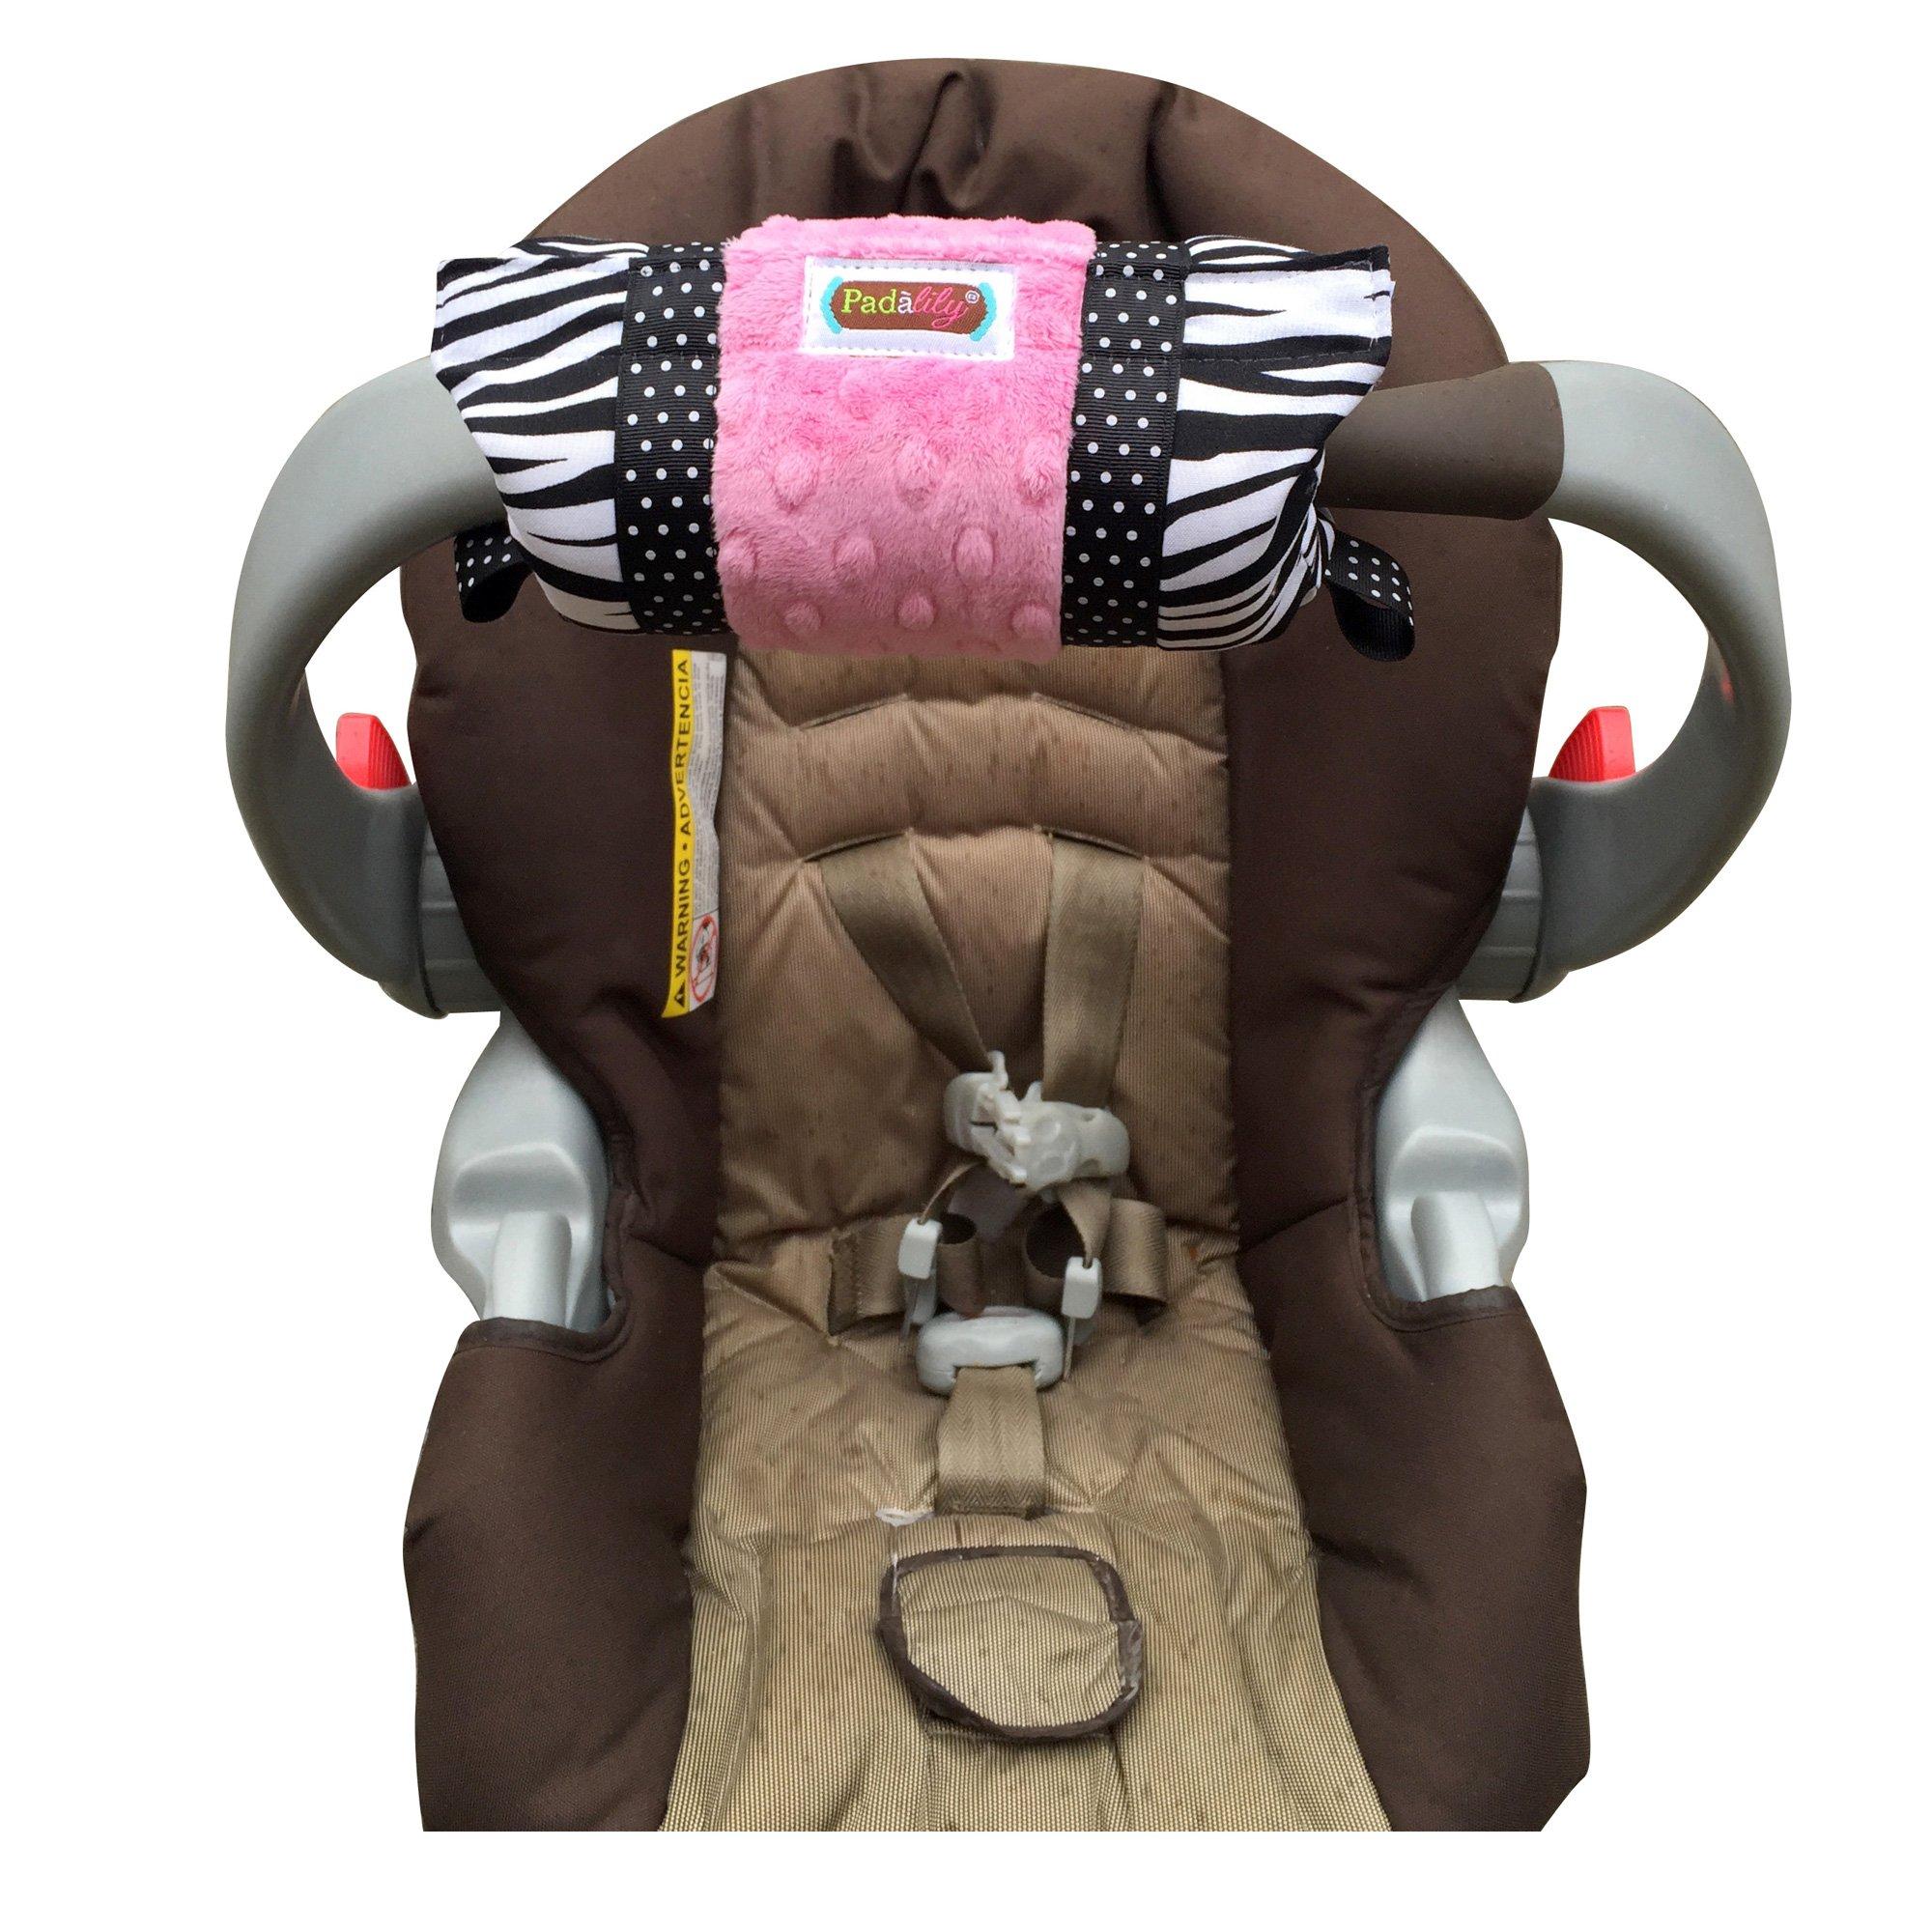 Padalilys Hottie Tottie Car Seat Stylish Handle Cushion